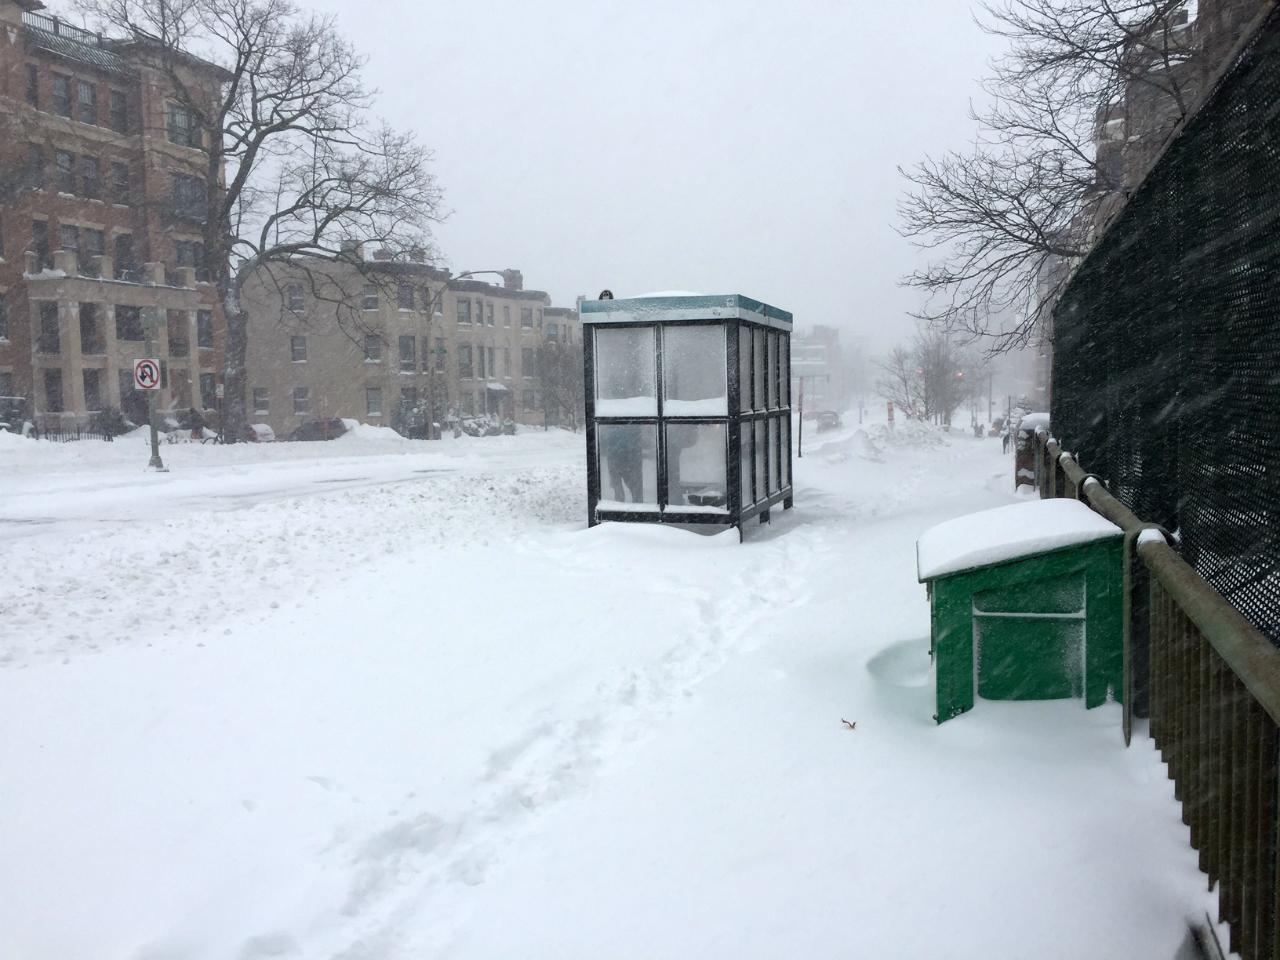 fenway-bus-shelter.jpg